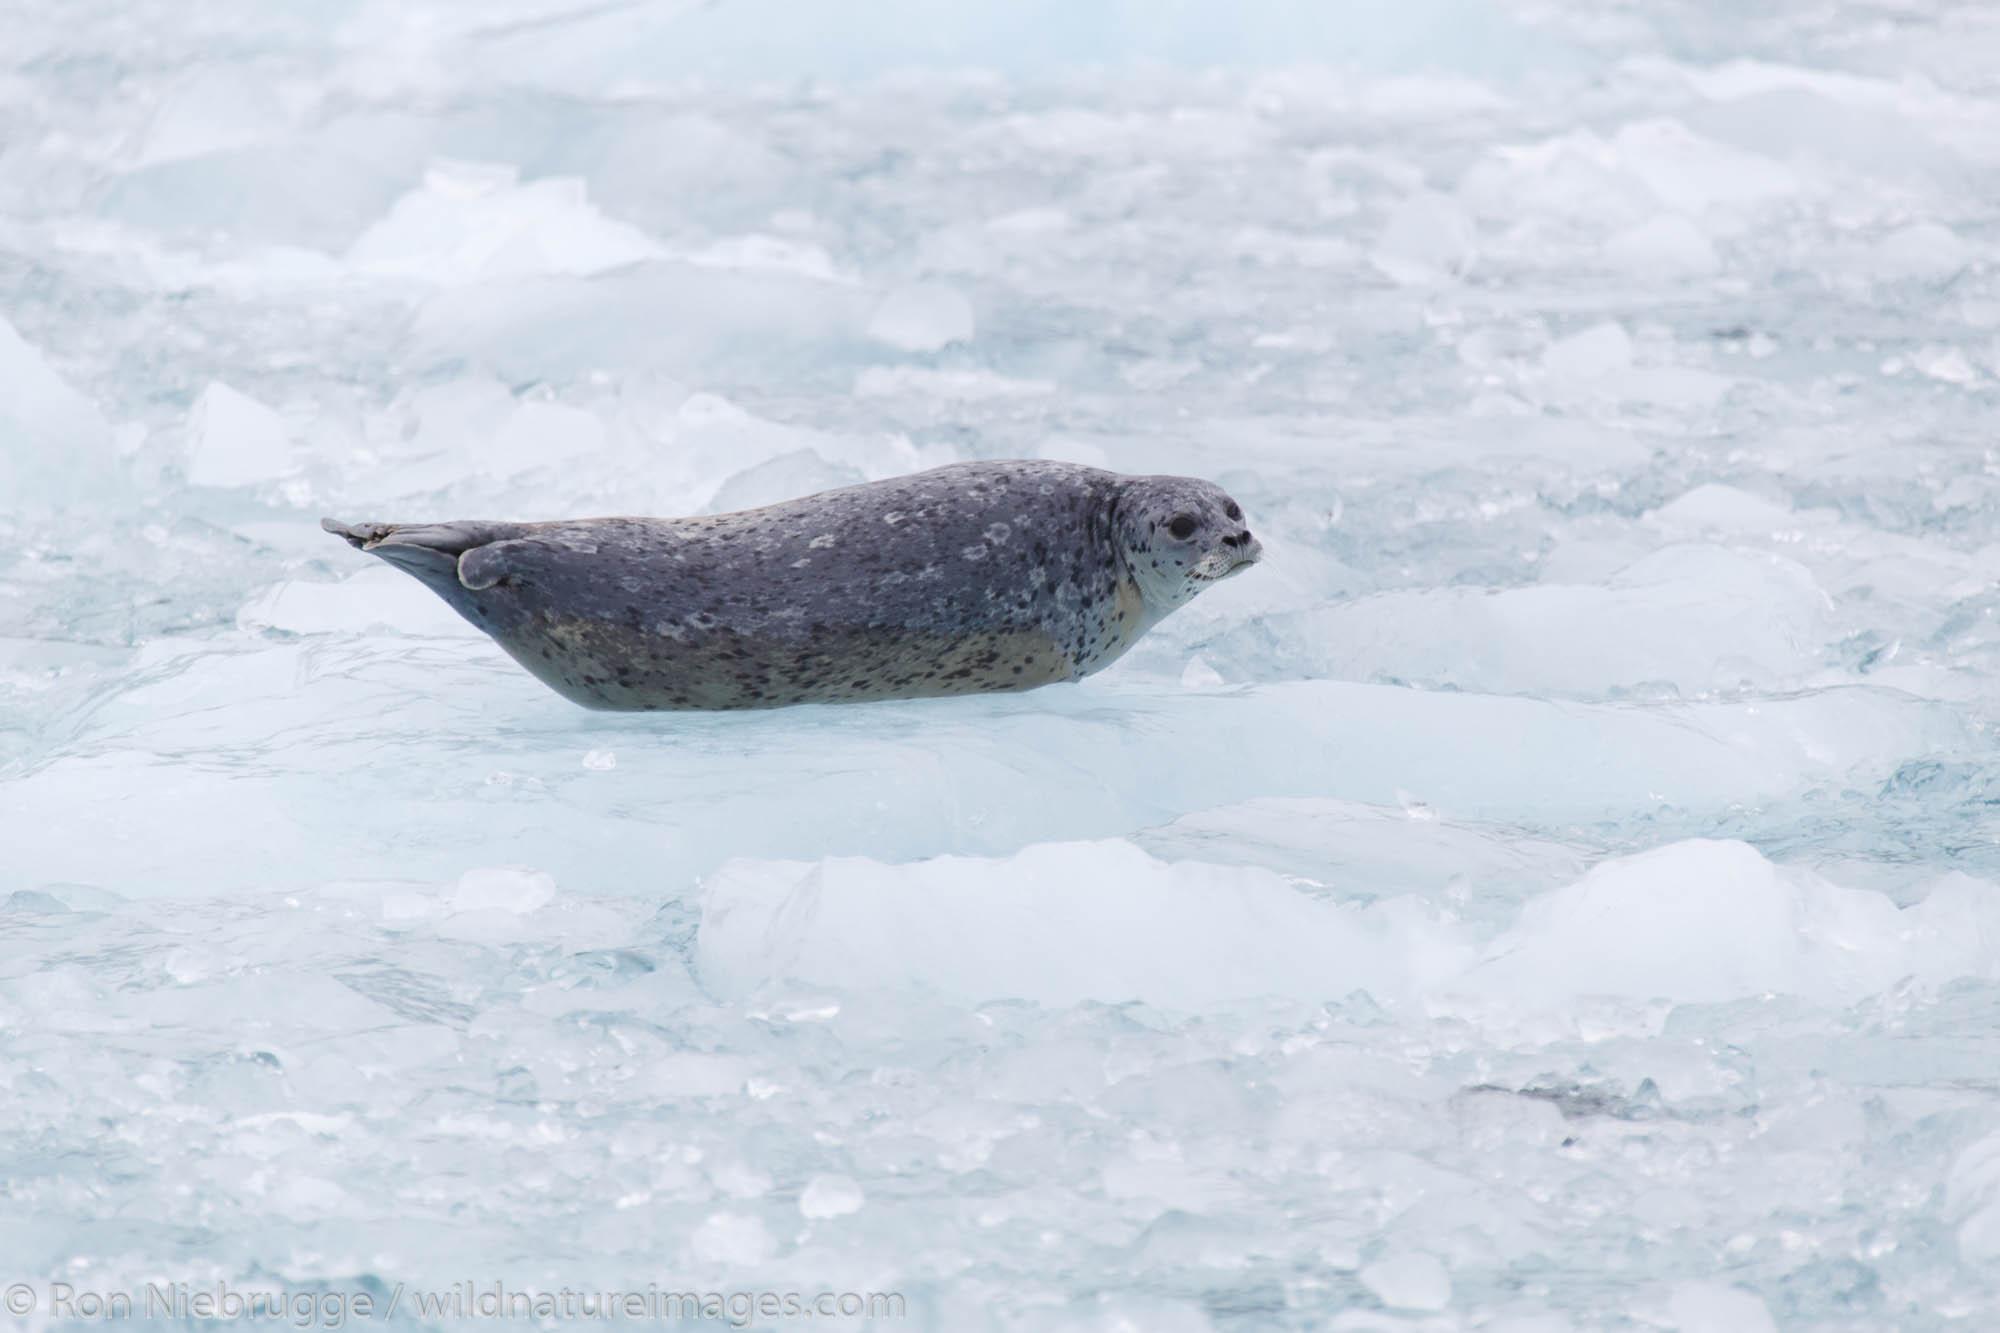 Harbor Seal (Phoca vitulina) at Chenega Glacier in Nassau Fjord, Prince William Sound, Chugach National Forest, Alaska.